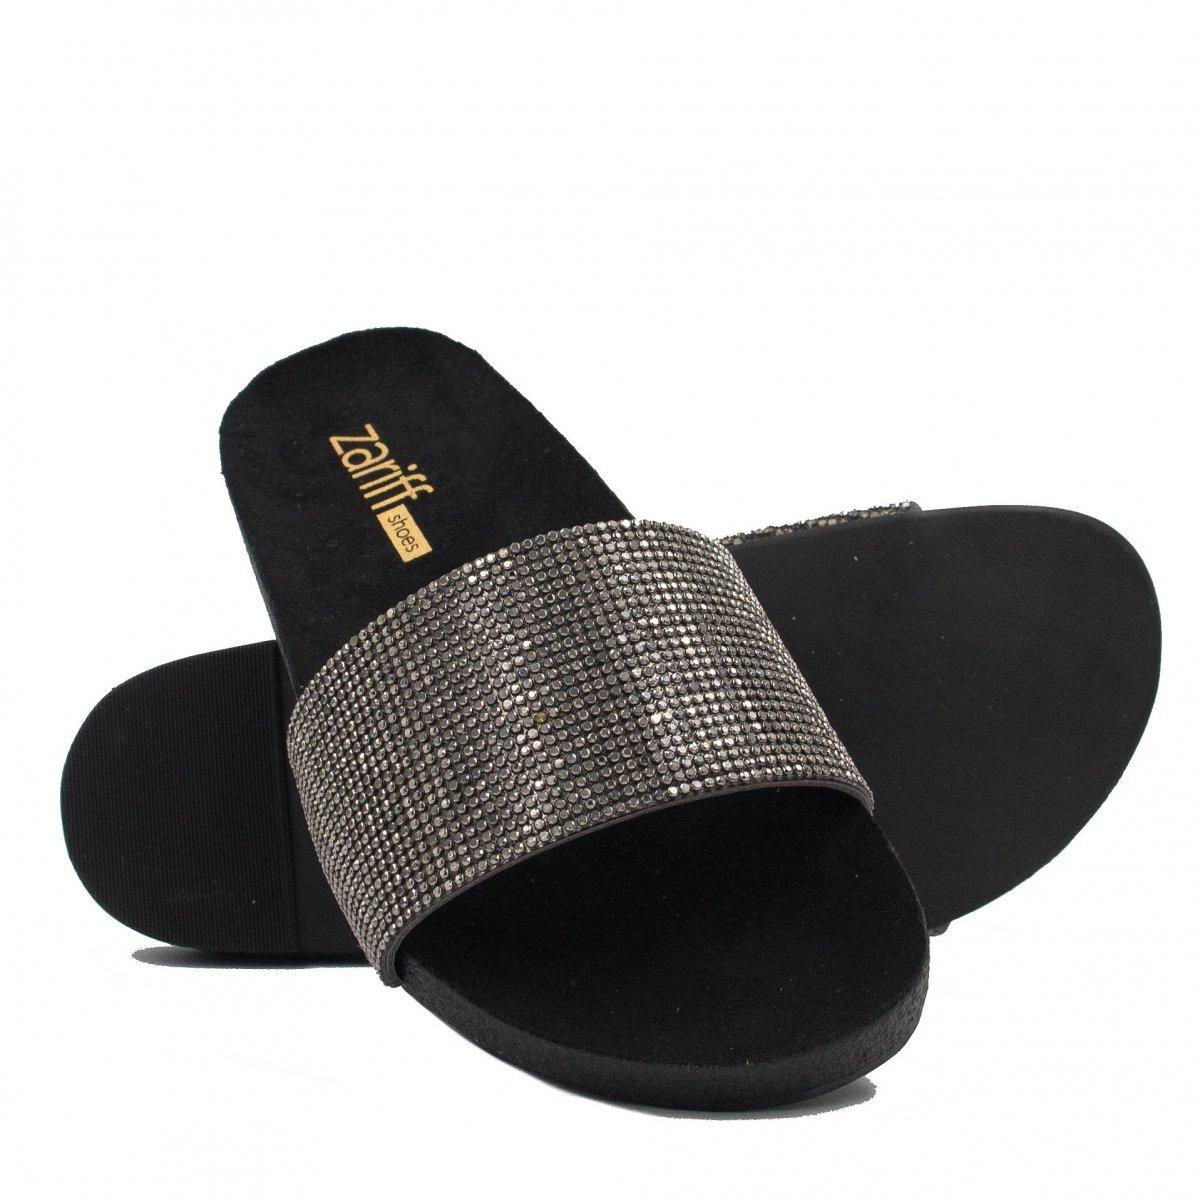 6f87f97a26 tamanco zariff shoes birken strass 108015. Carregando zoom.